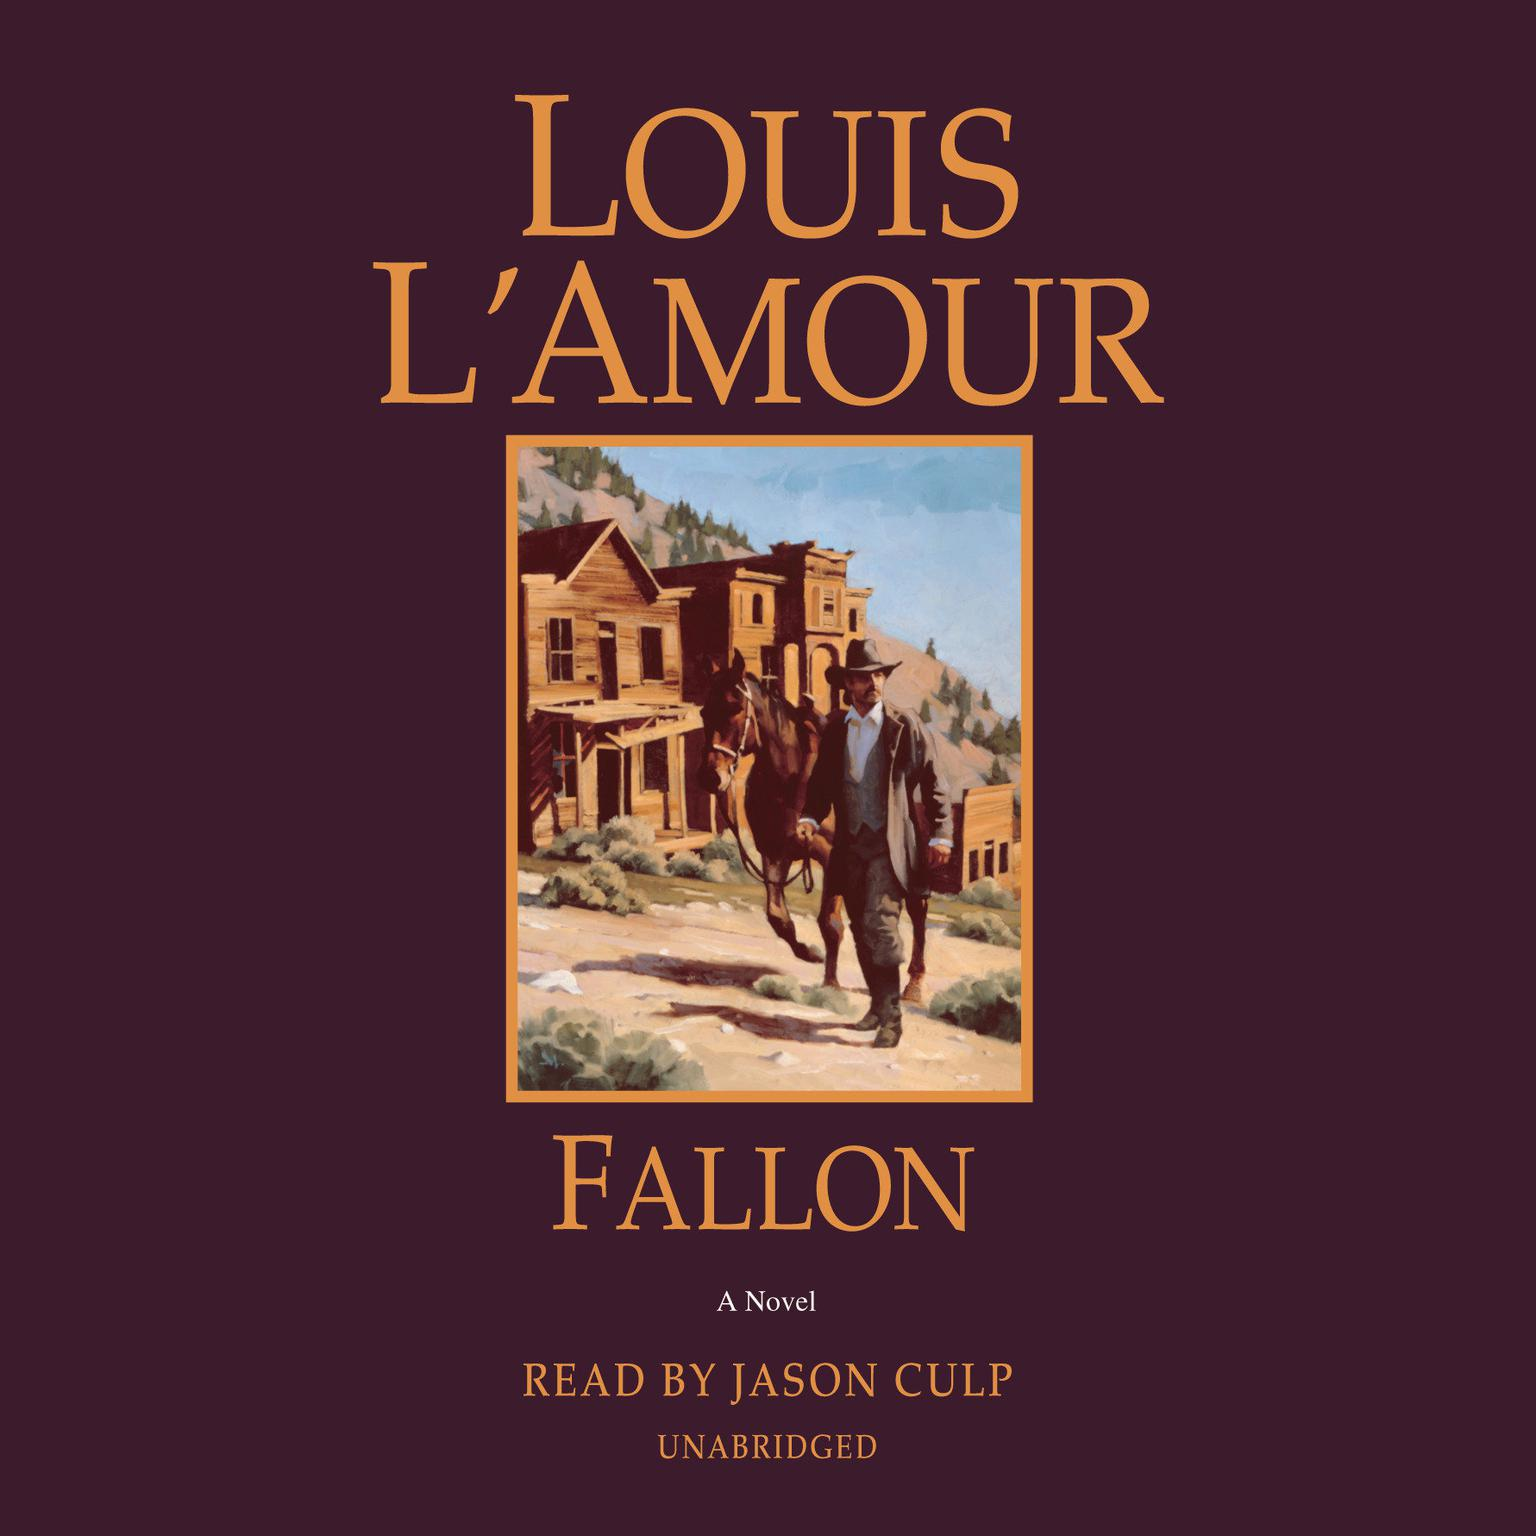 Fallon: A Novel Audiobook, by Louis L'Amour